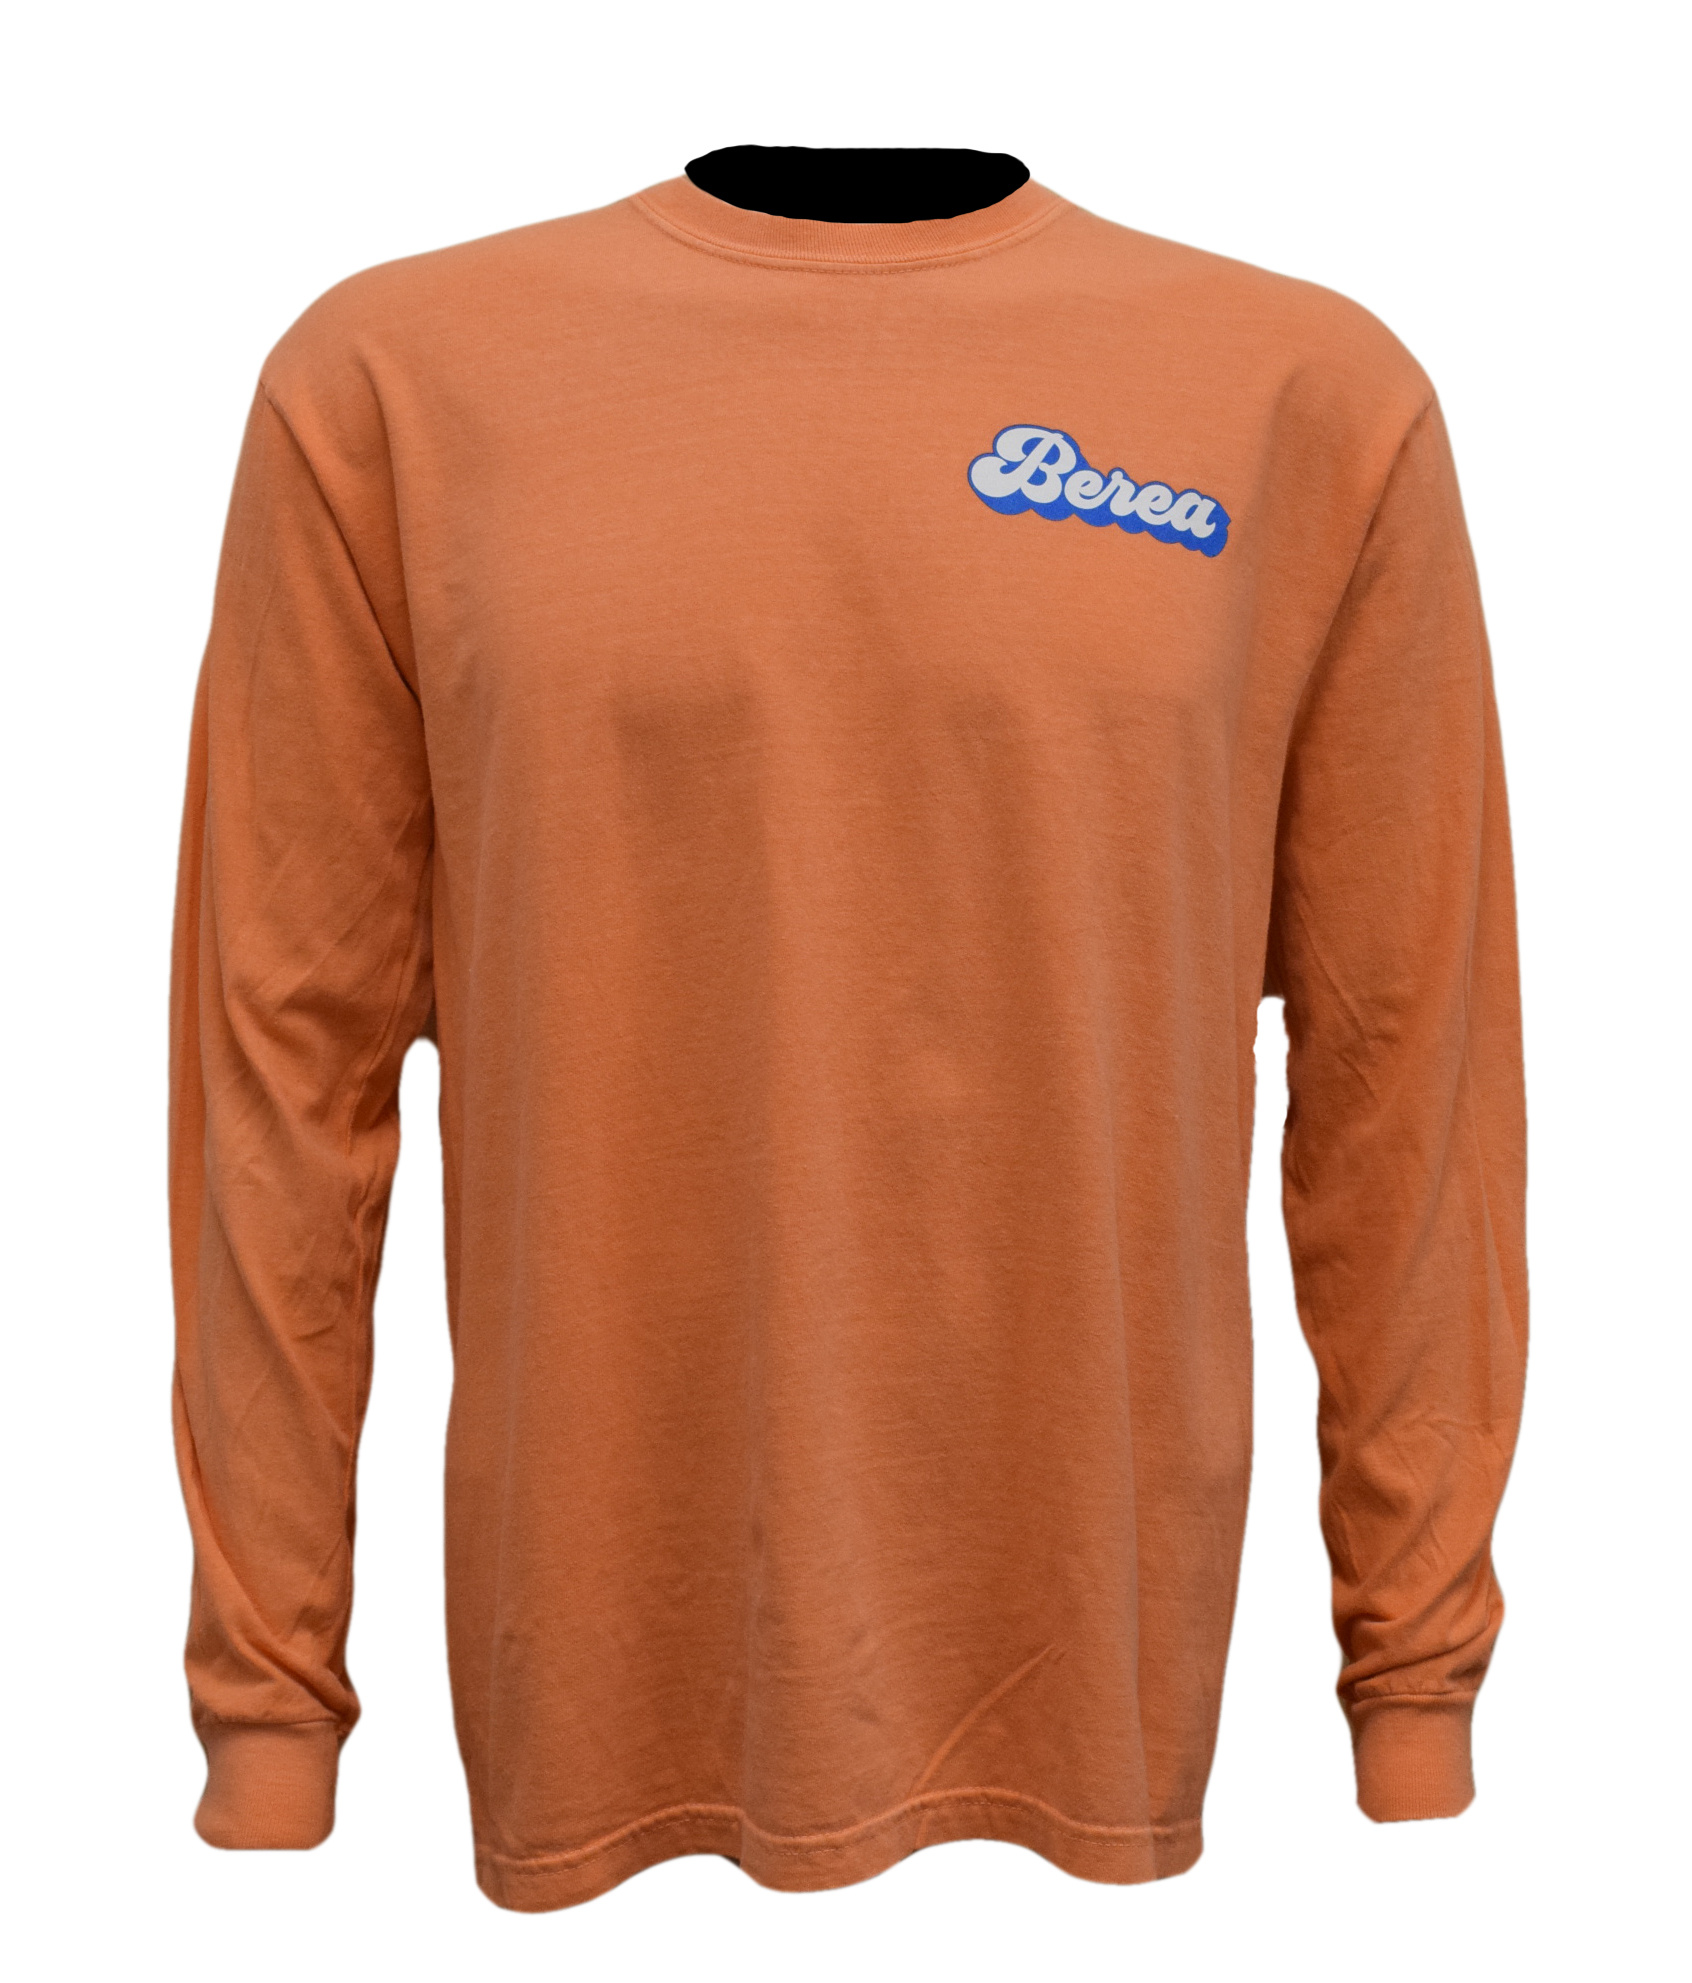 Berea Far Out T-Shirt-4